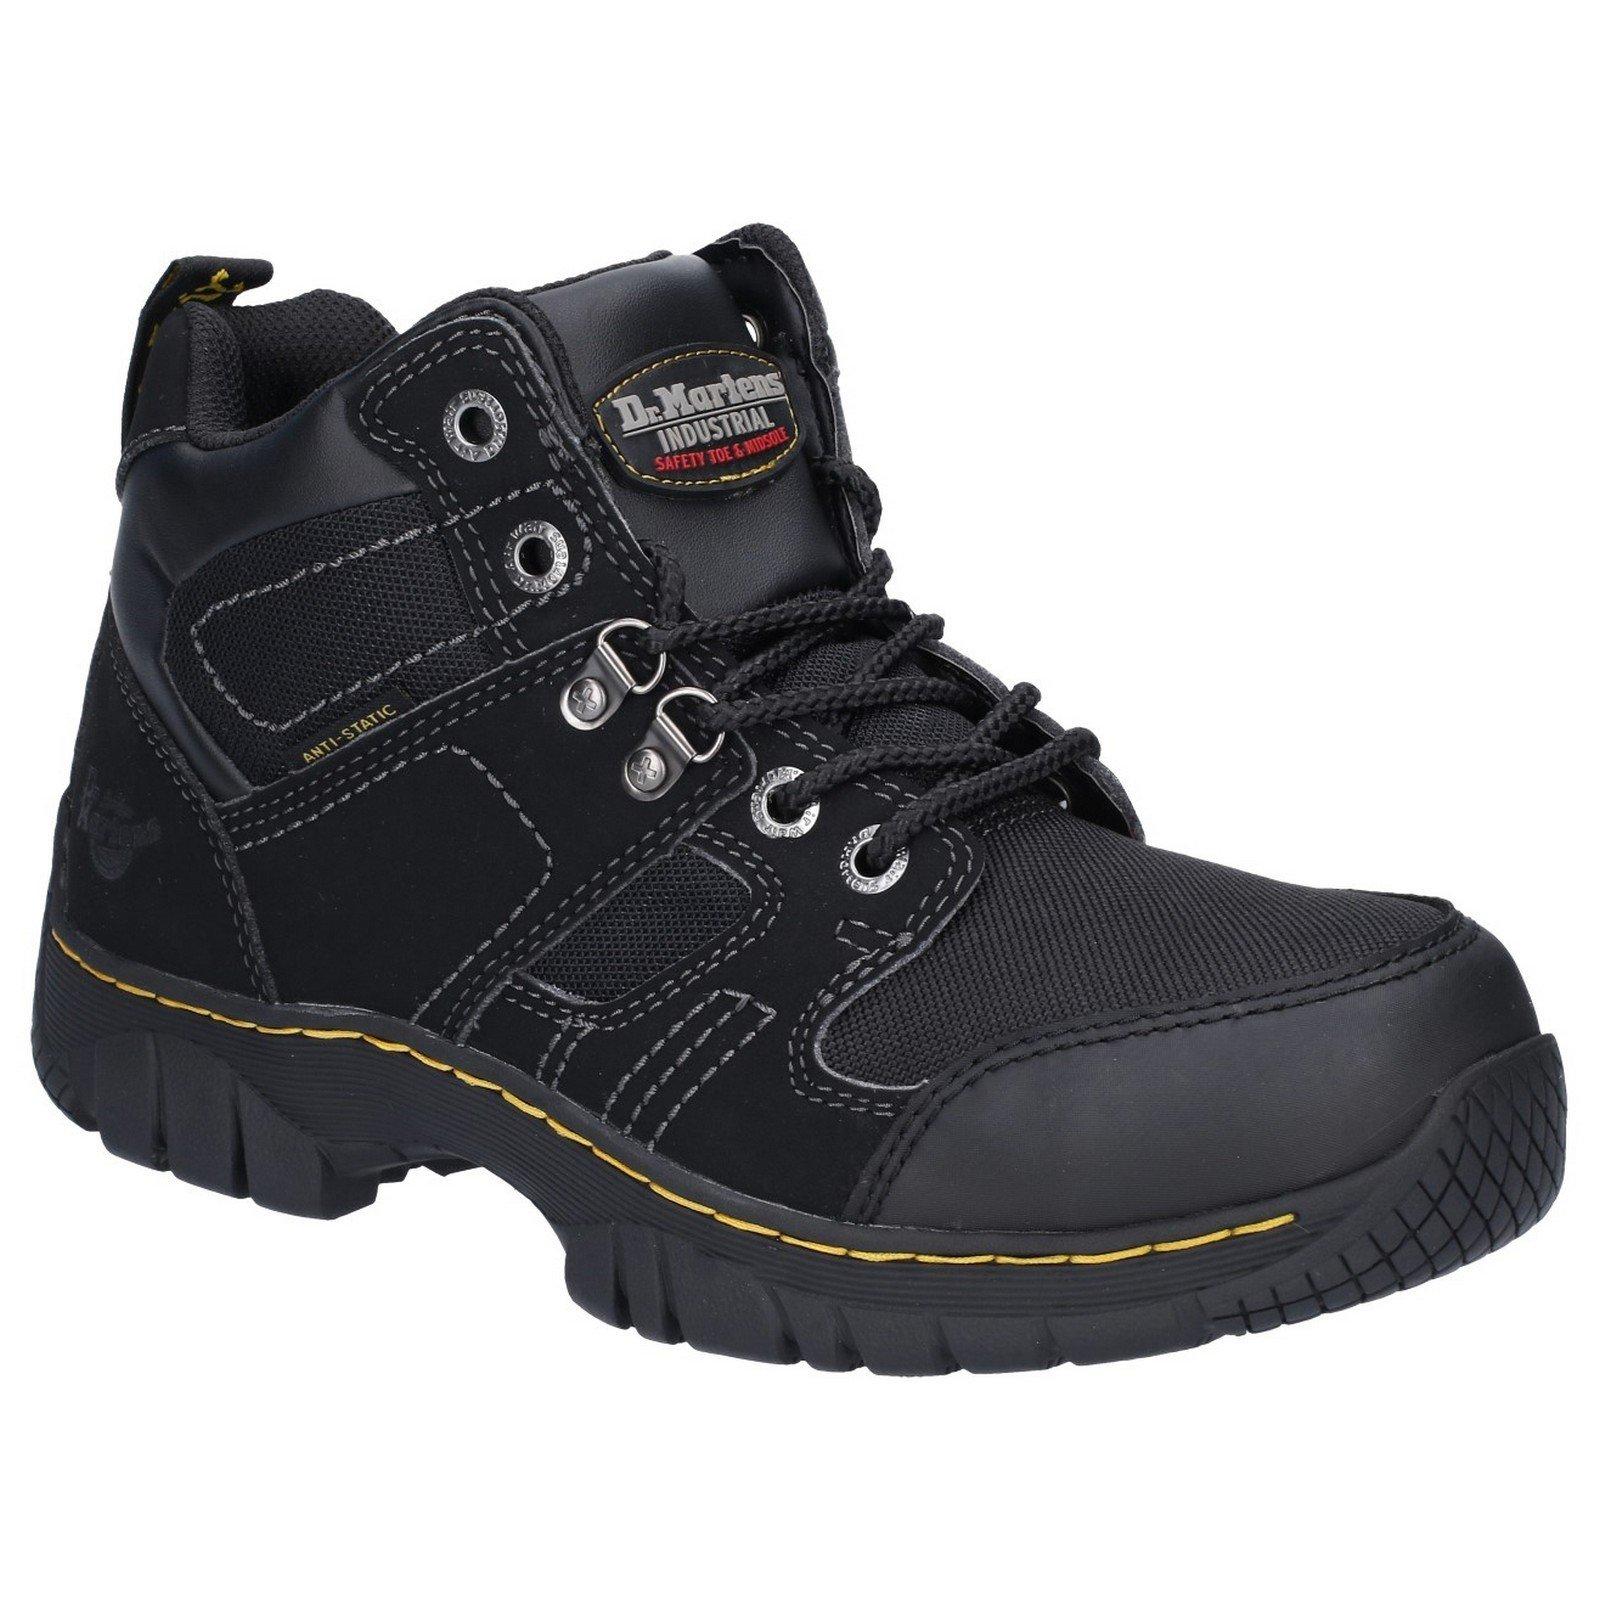 Dr Martens Unisex Benham Safety Boots Black 21647-34773 - Black 12